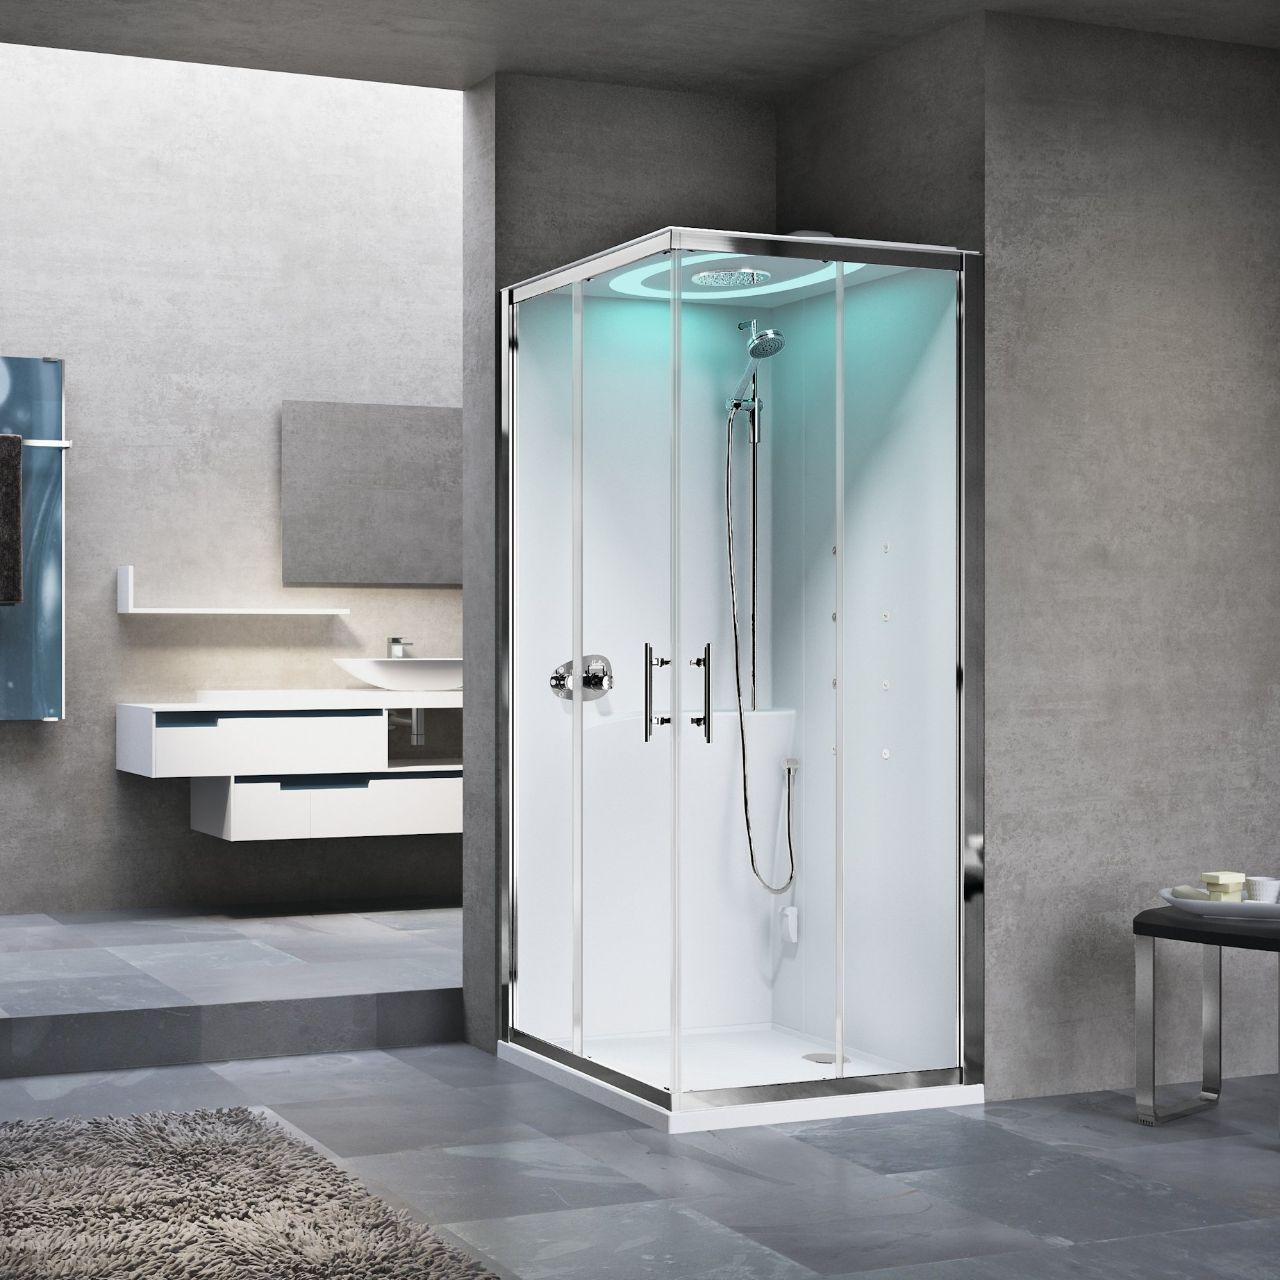 Cabine doccia Eon - Novellini